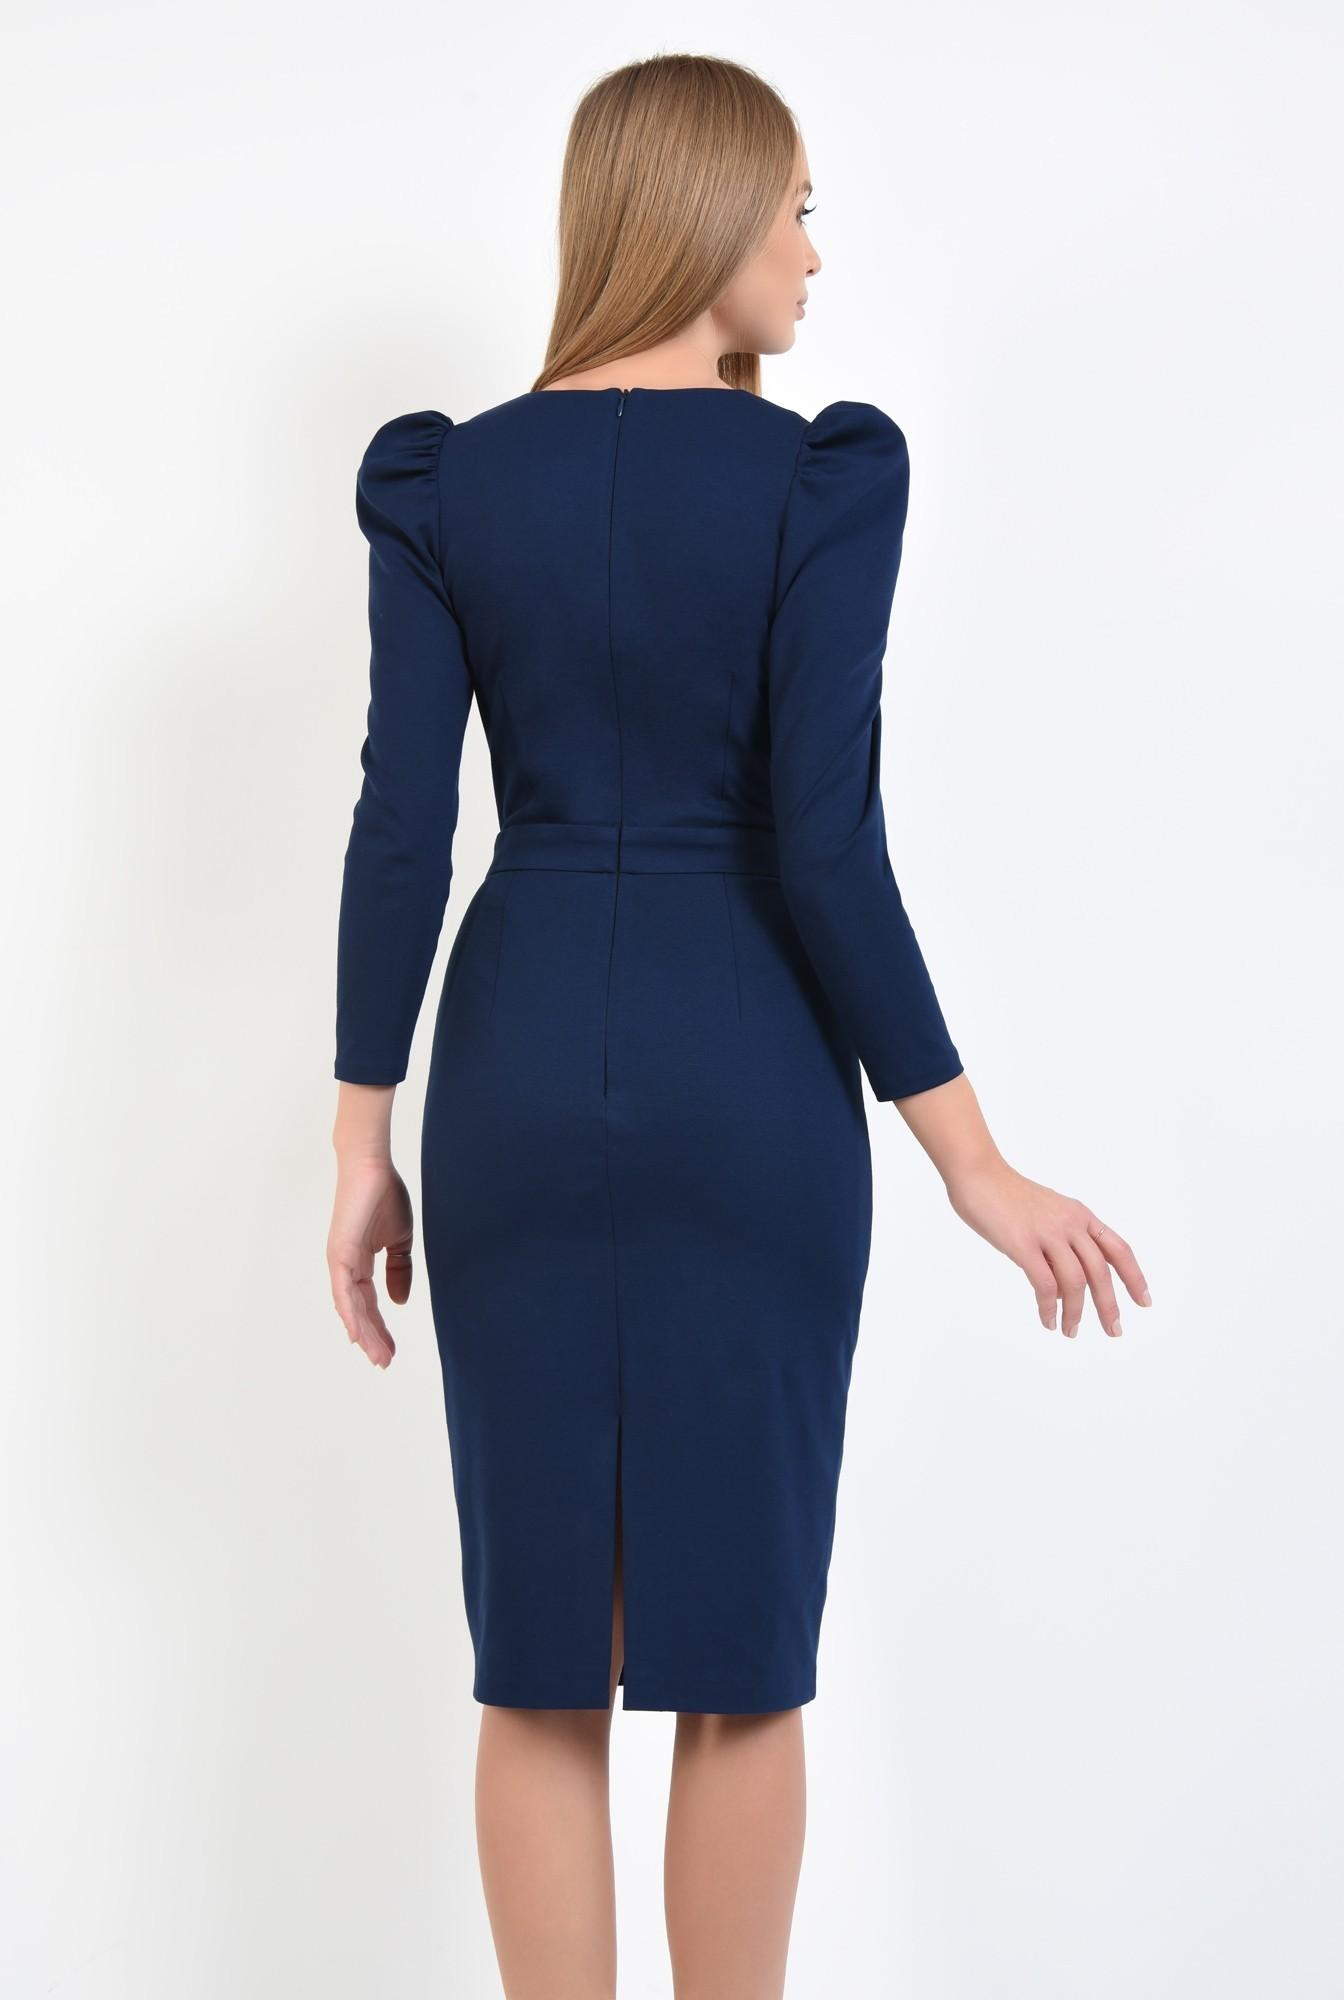 1 - 360 - rochie conica, decolteu in V, cret la umar, rochii online